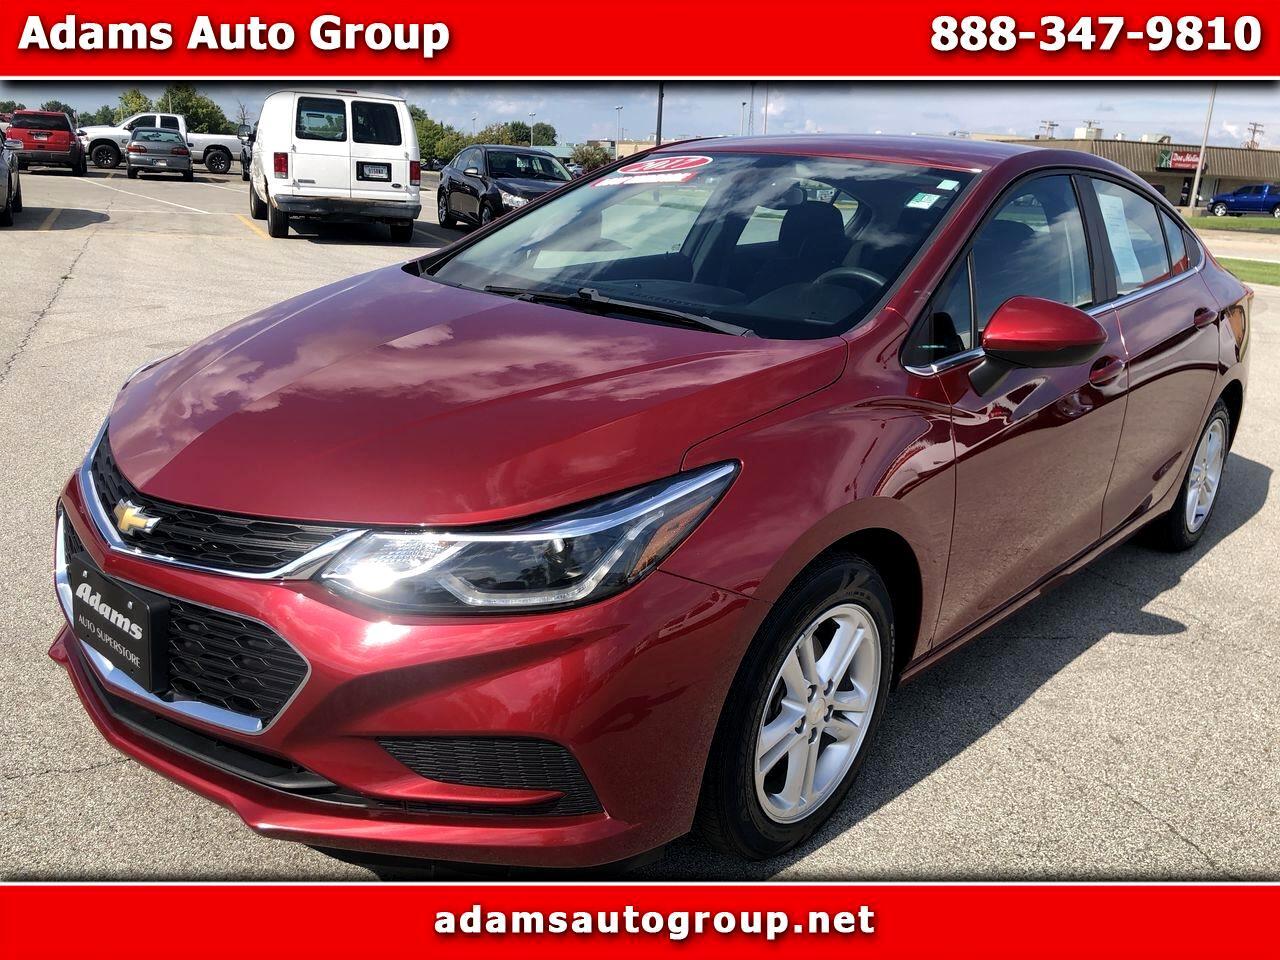 Chevrolet Cruze 4dr Sdn 1.4L LT w/1SD 2017